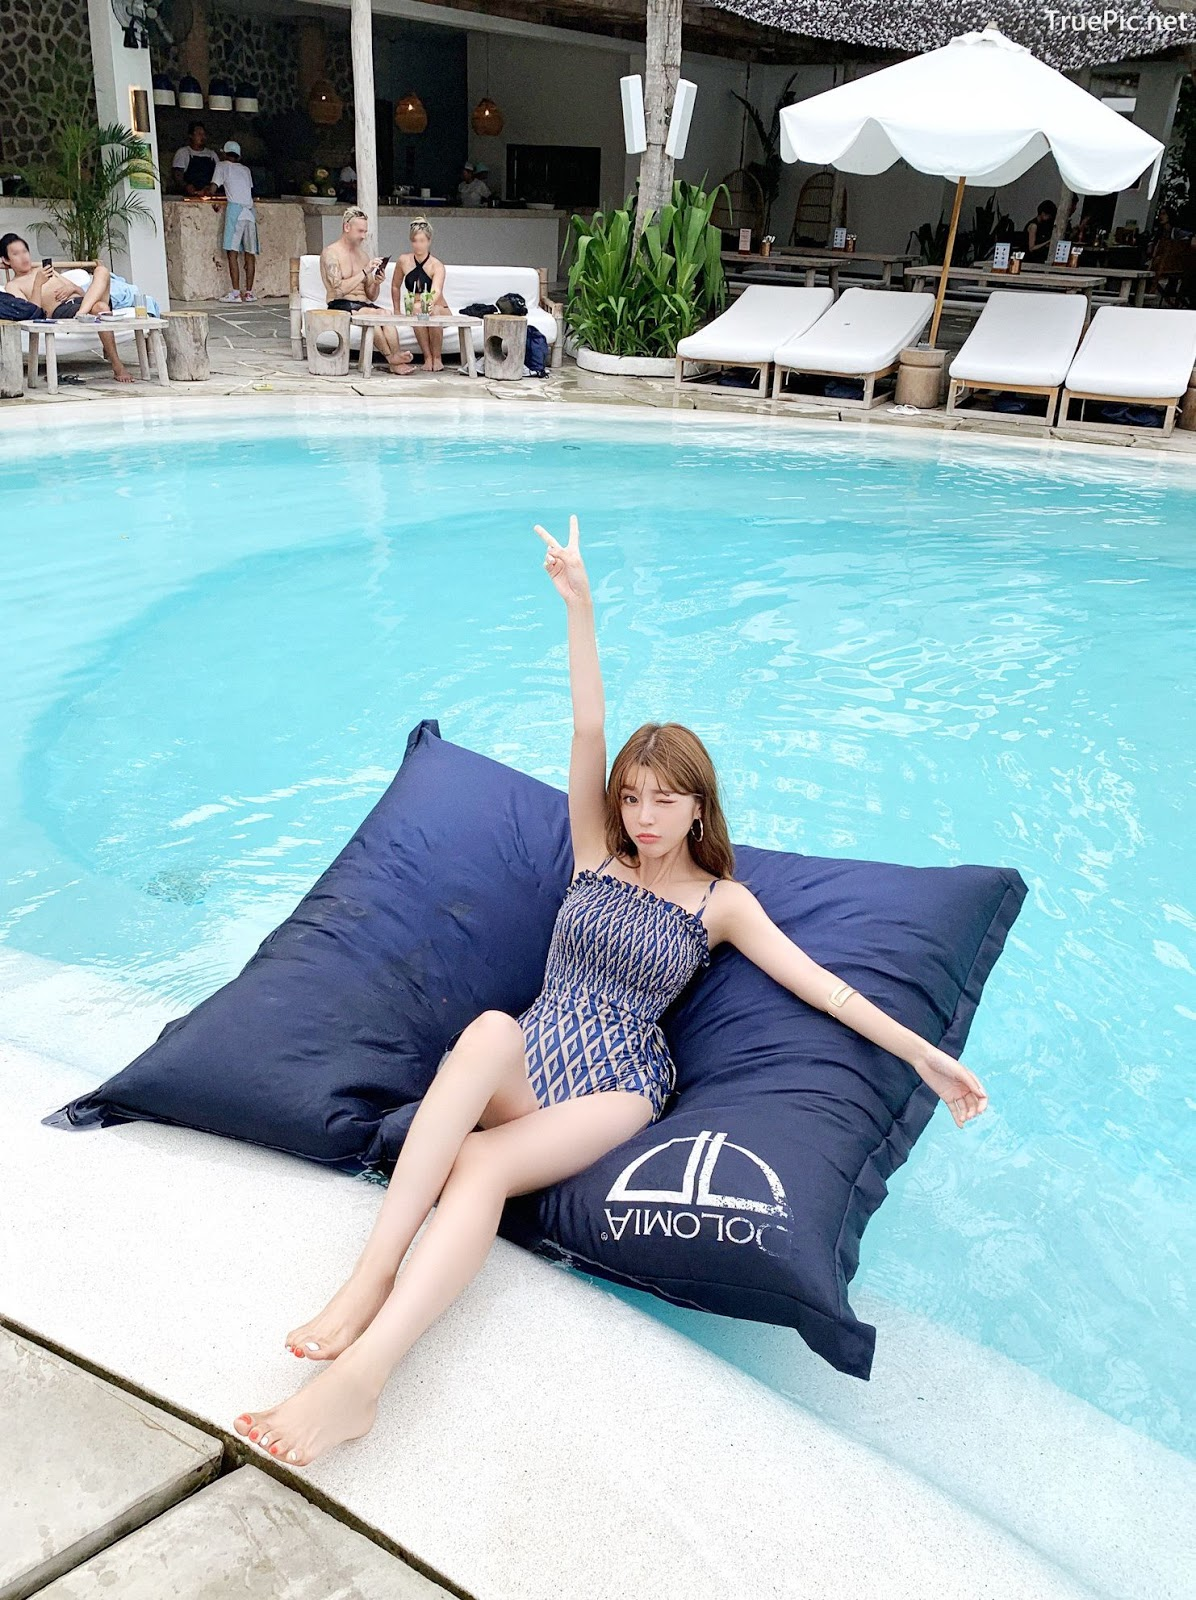 Image Korean Fashion Model - Cha Yoo Jin - Diamond Smoke Monokini - TruePic.net - Picture-3